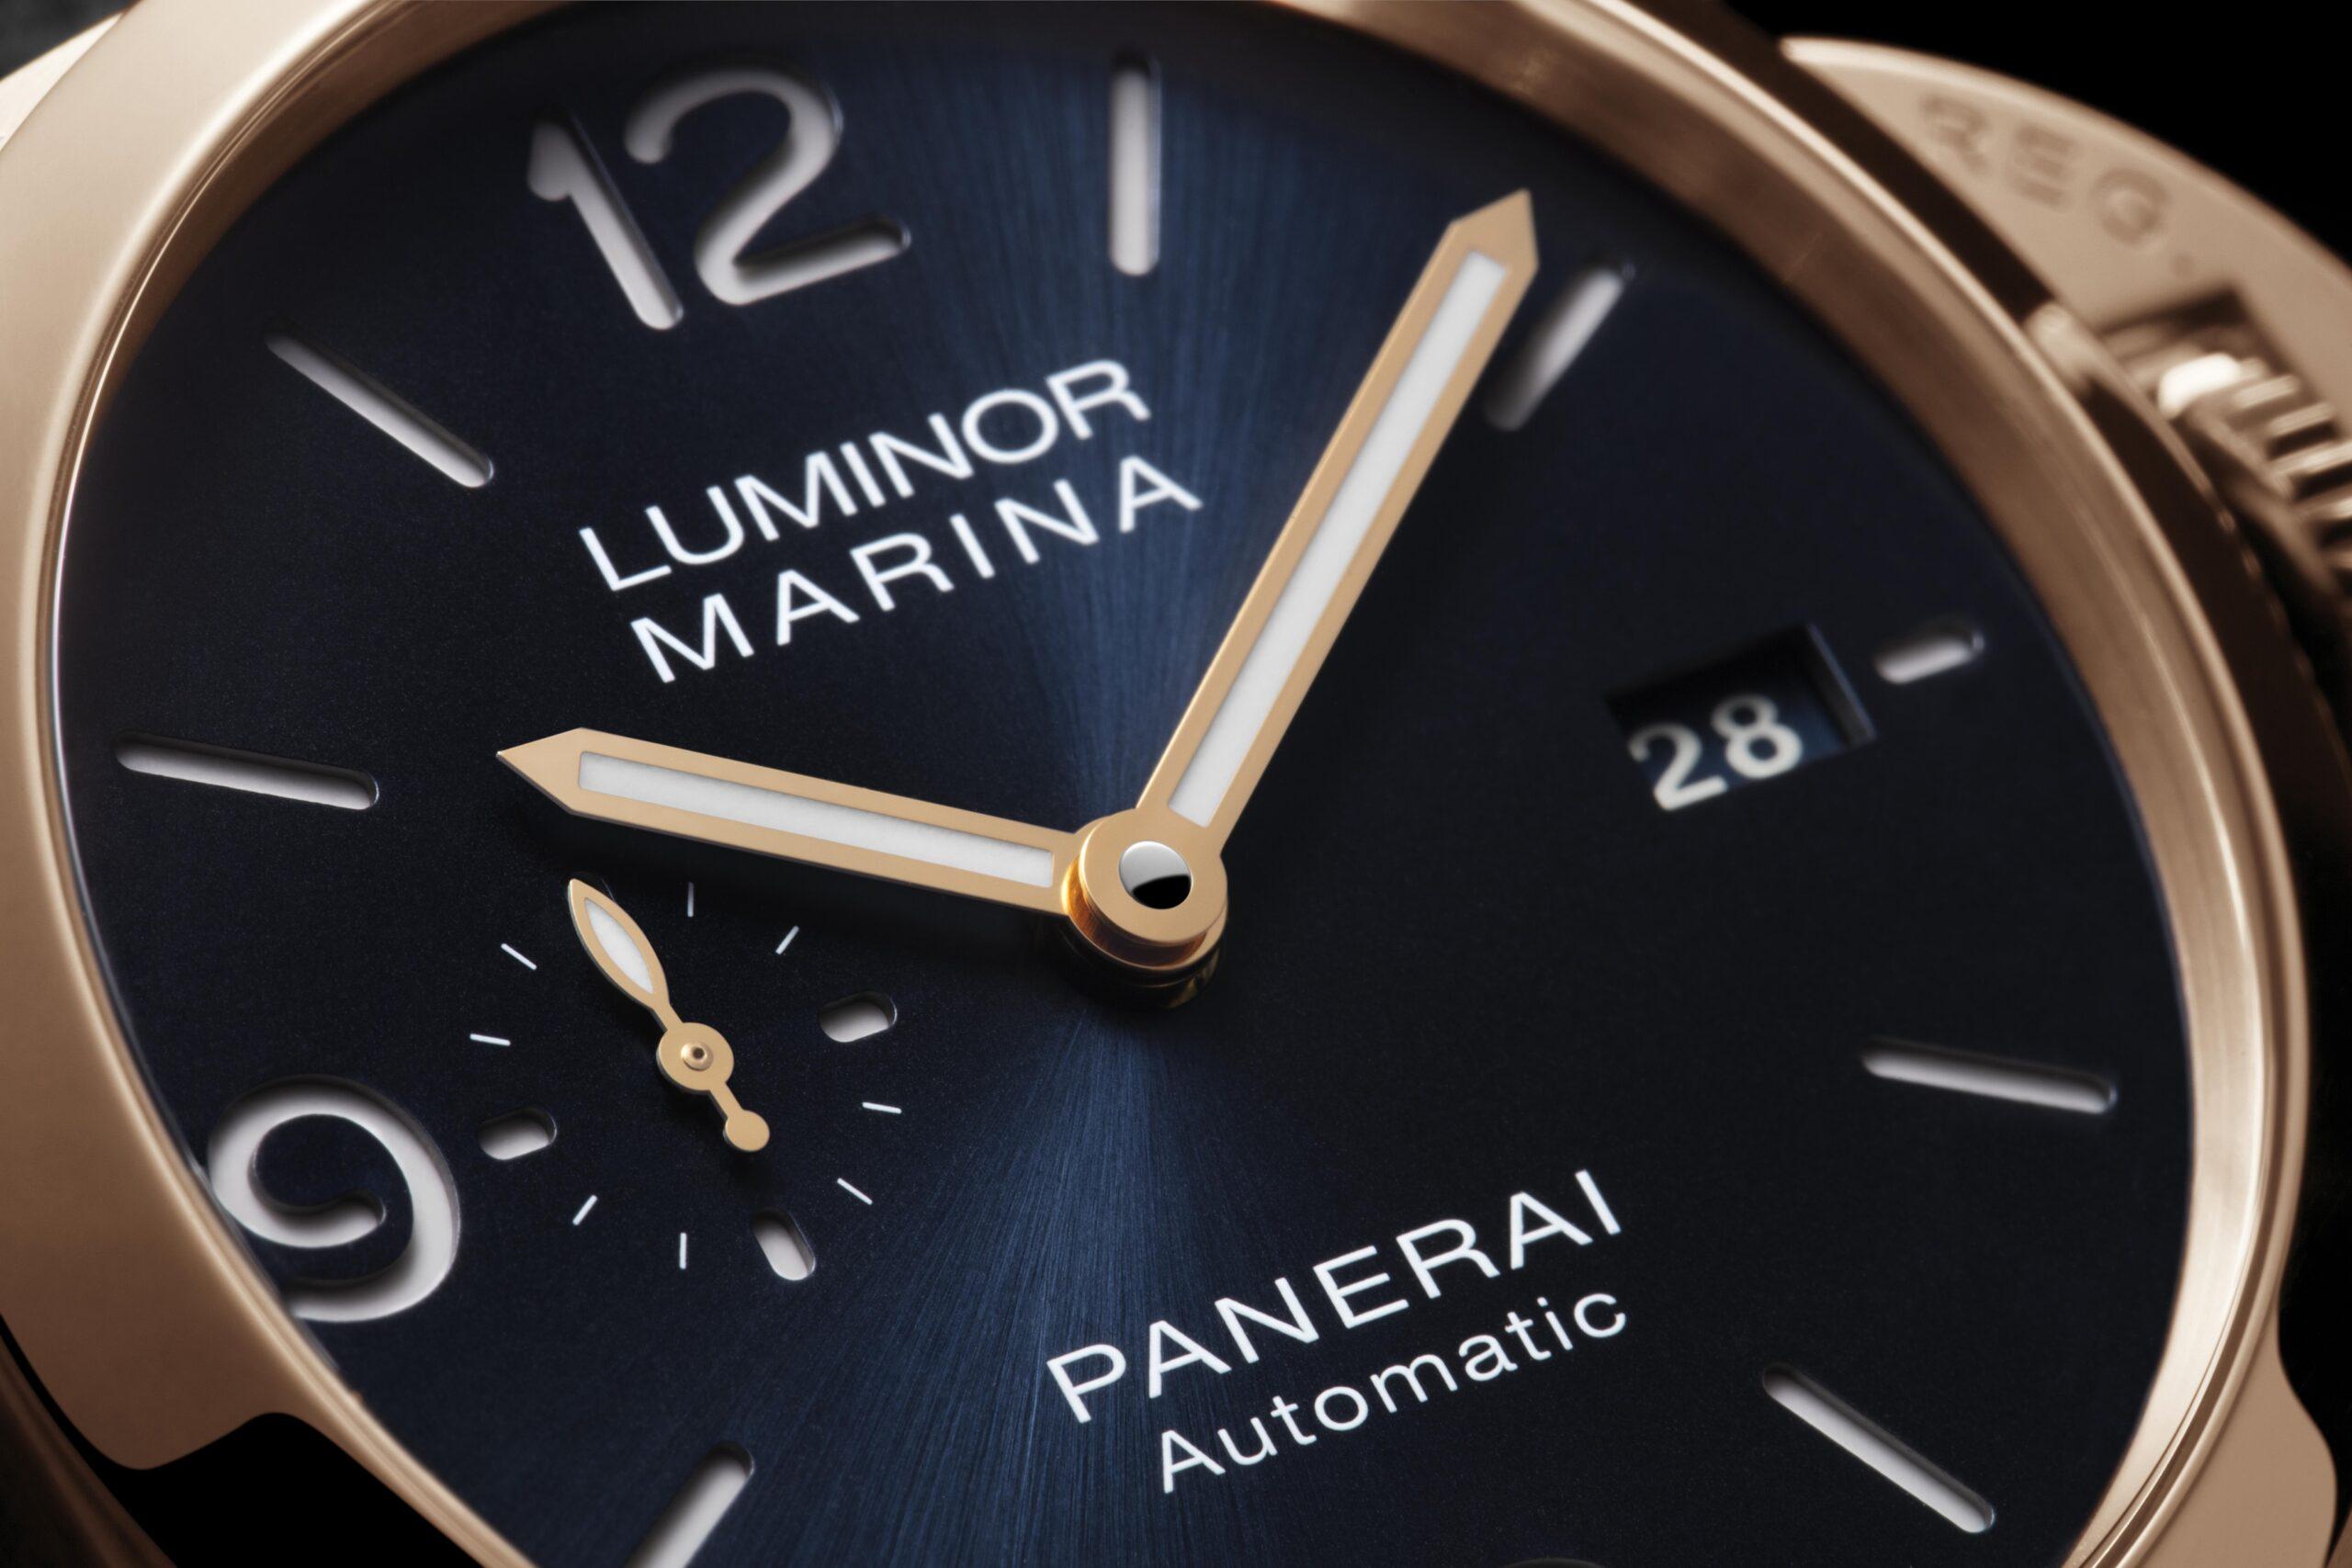 Panerai Luminor Marina 44 mm Goldtech Watches Wonders 2020-4